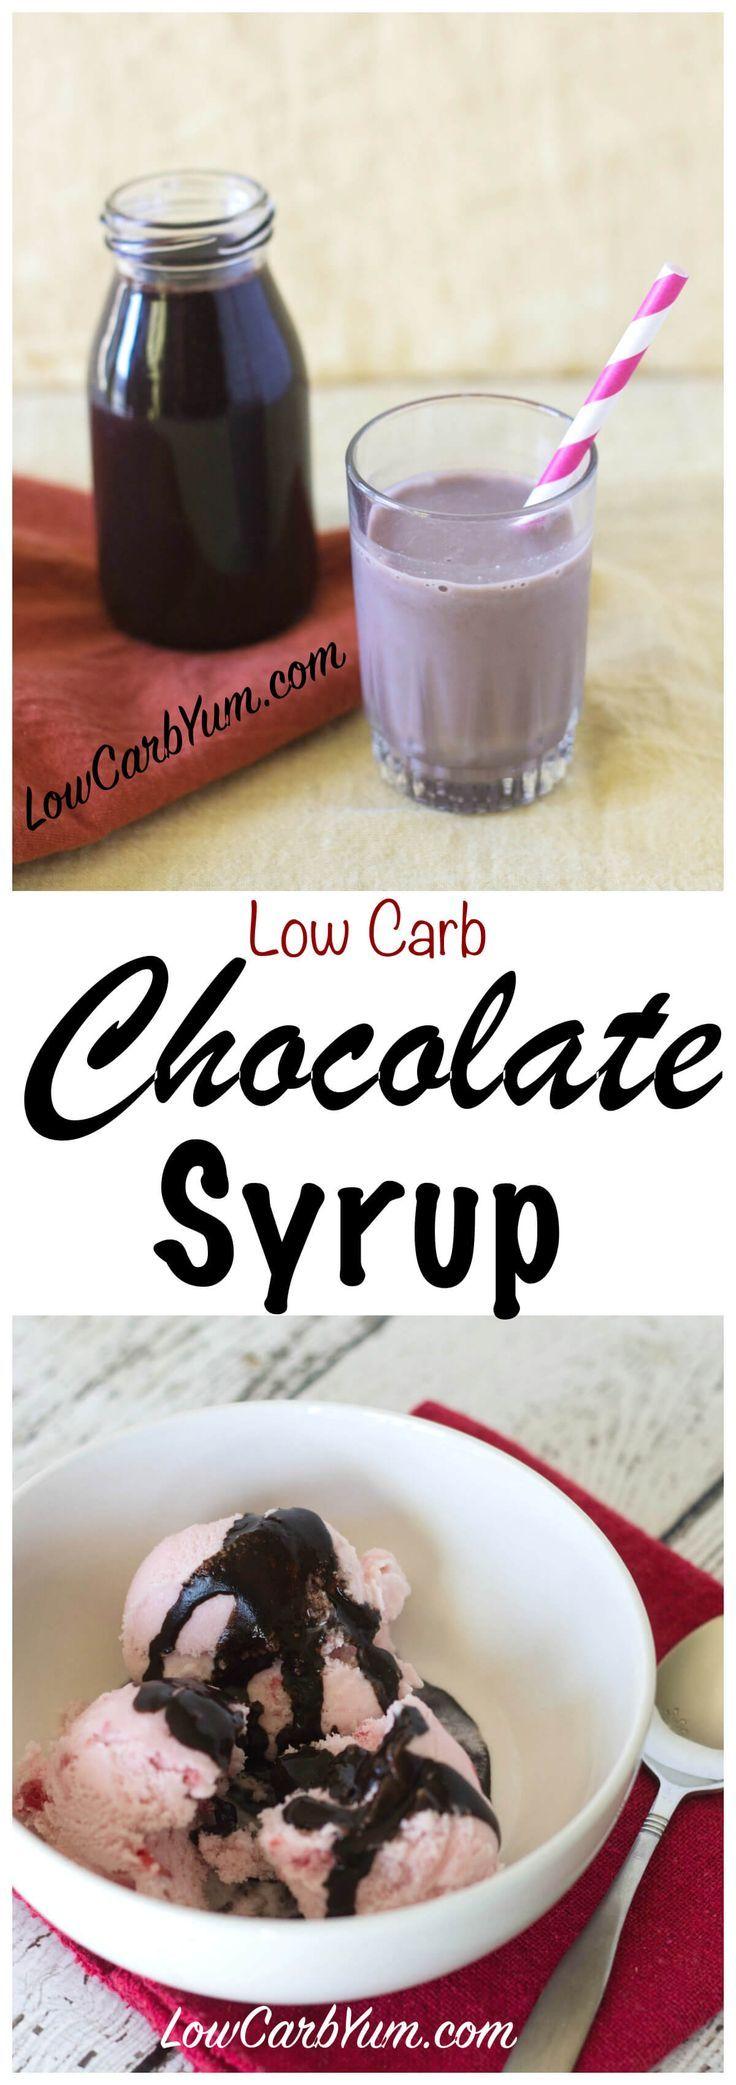 Sugar Free Chocolate Syrup | Recipe | Sugar free chocolate syrup ...